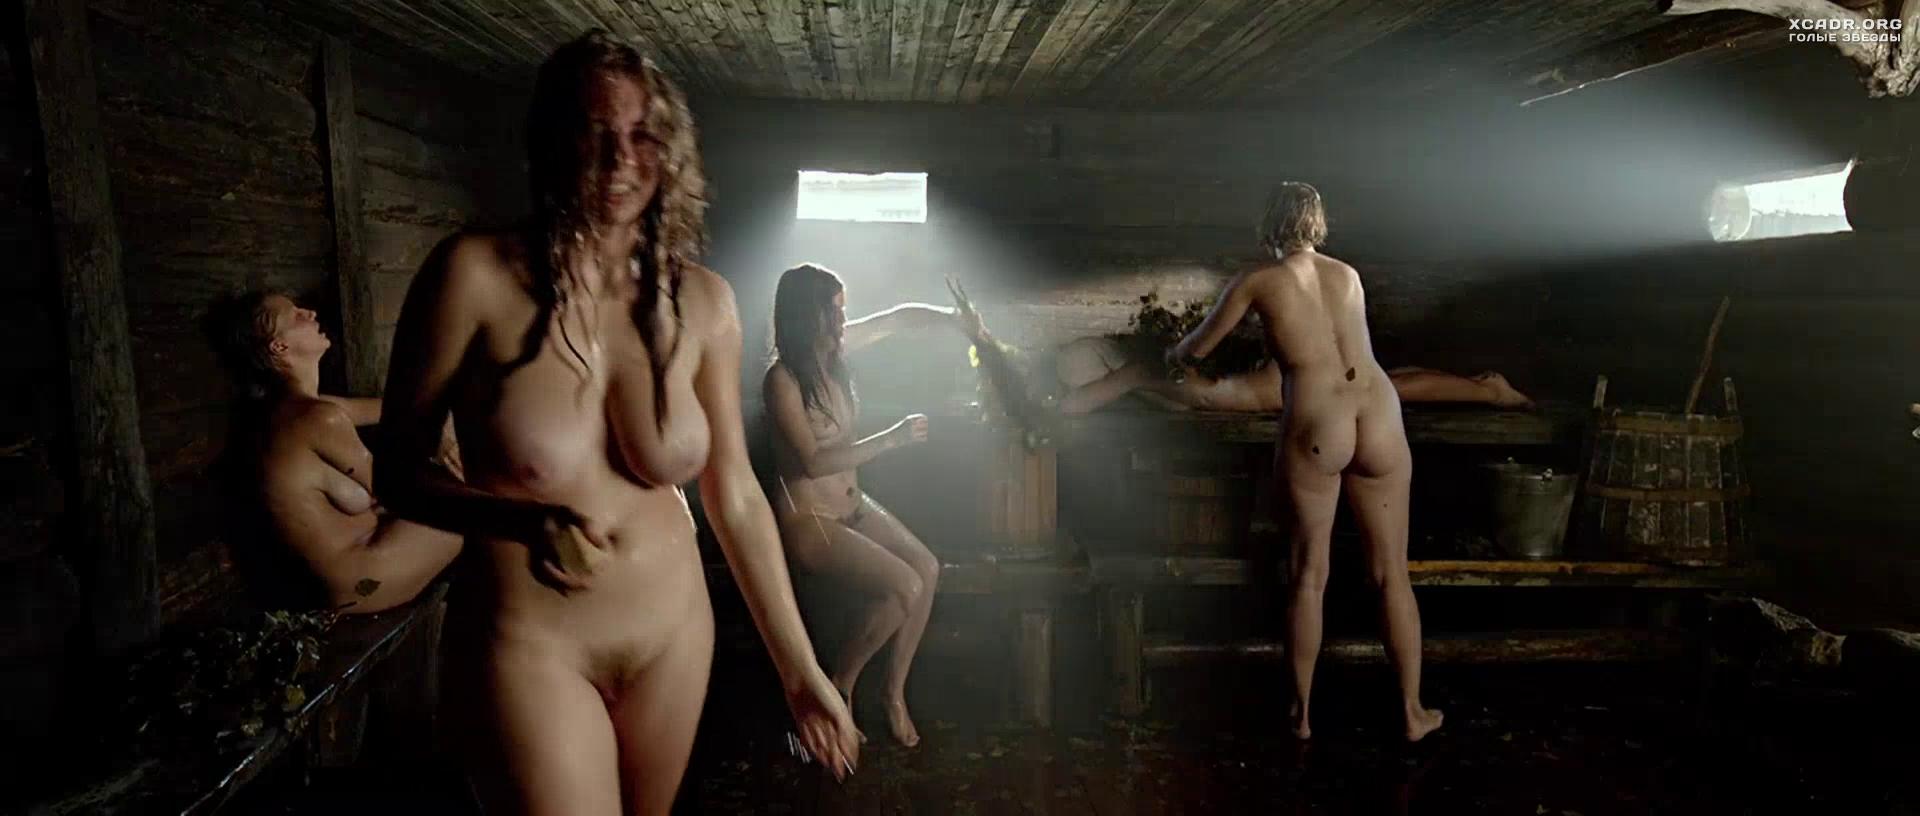 bolshie-golie-zrelie-dami-foto